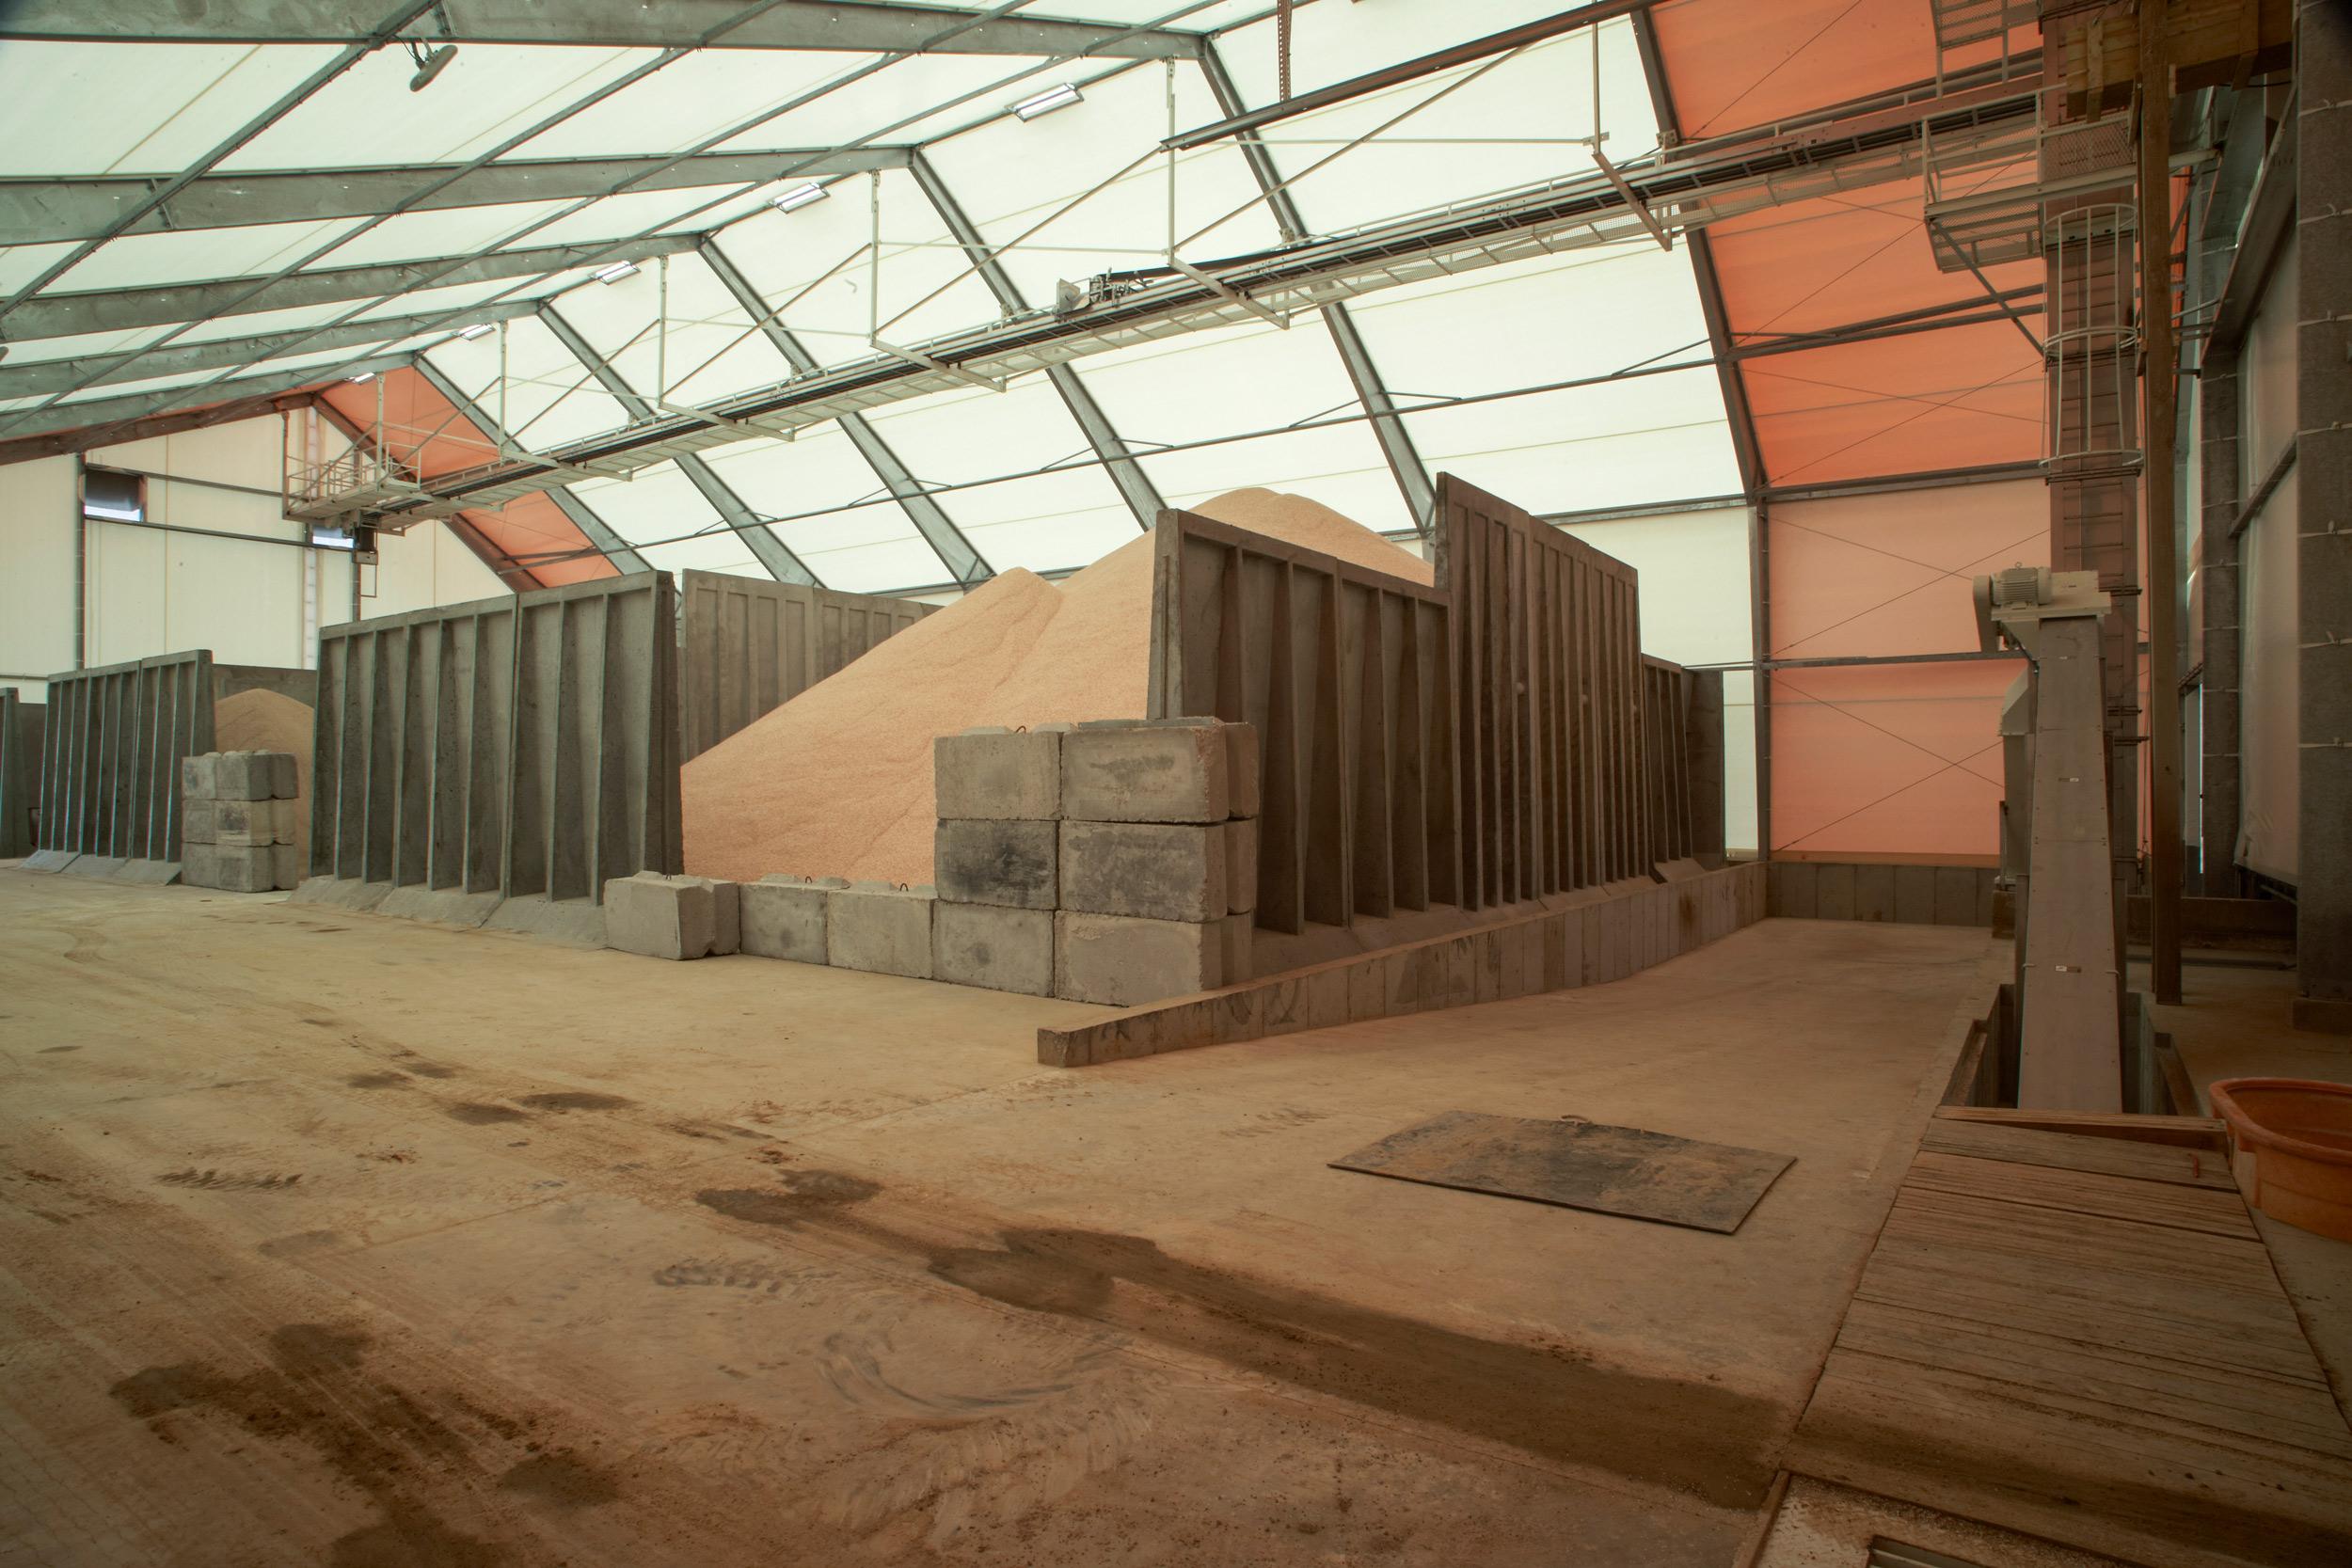 fabric feed storage building